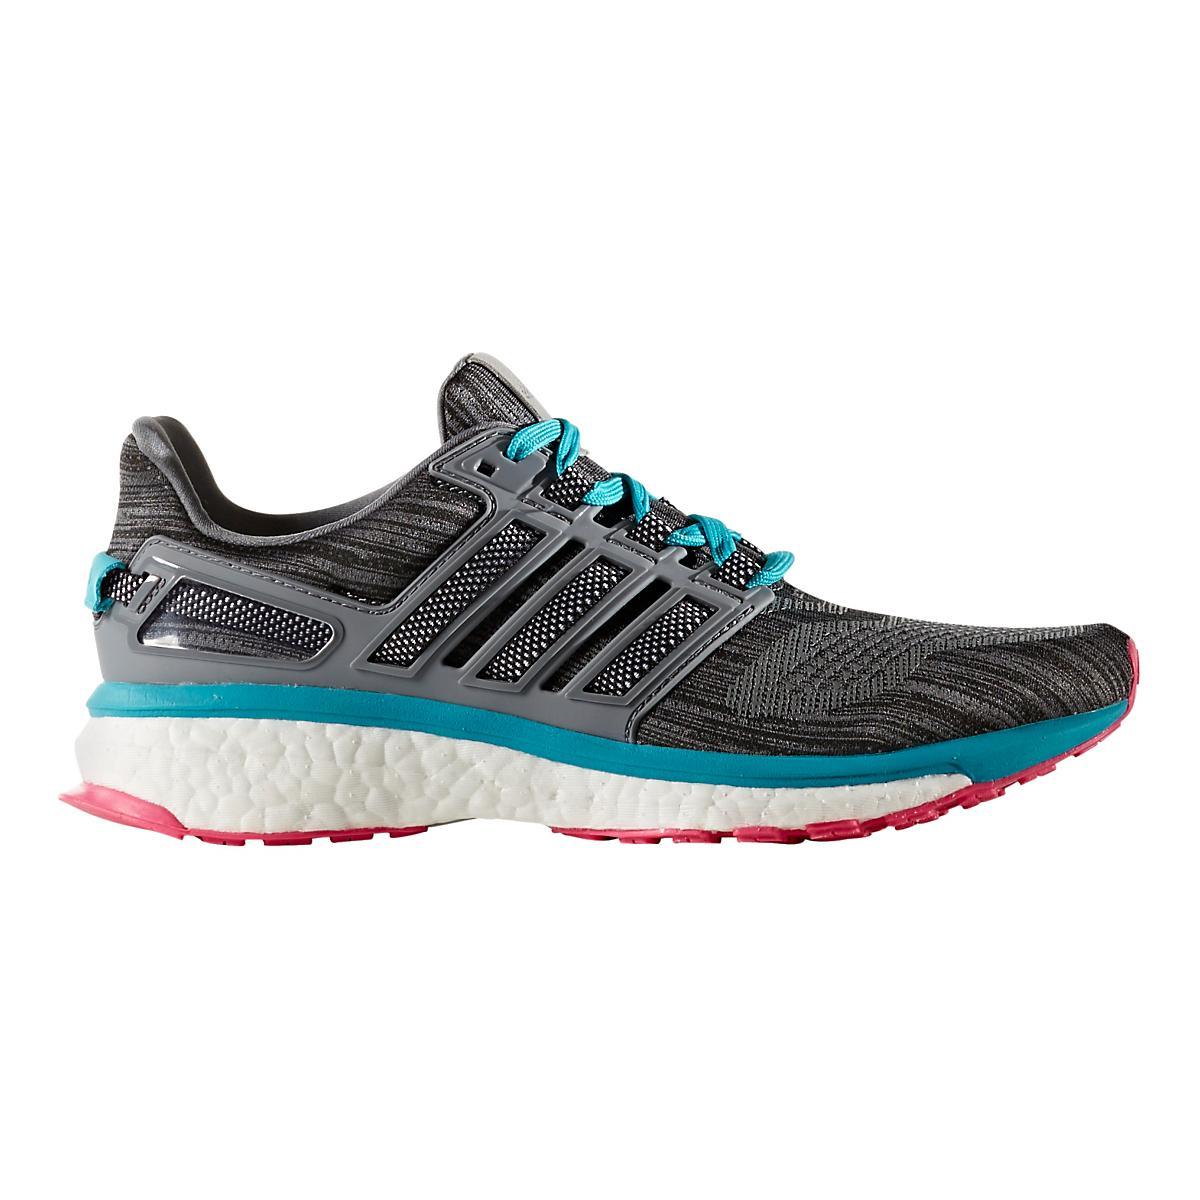 45b0b5bc4 Womens adidas Energy Boost 3 Running Shoe at Road Runner Sports